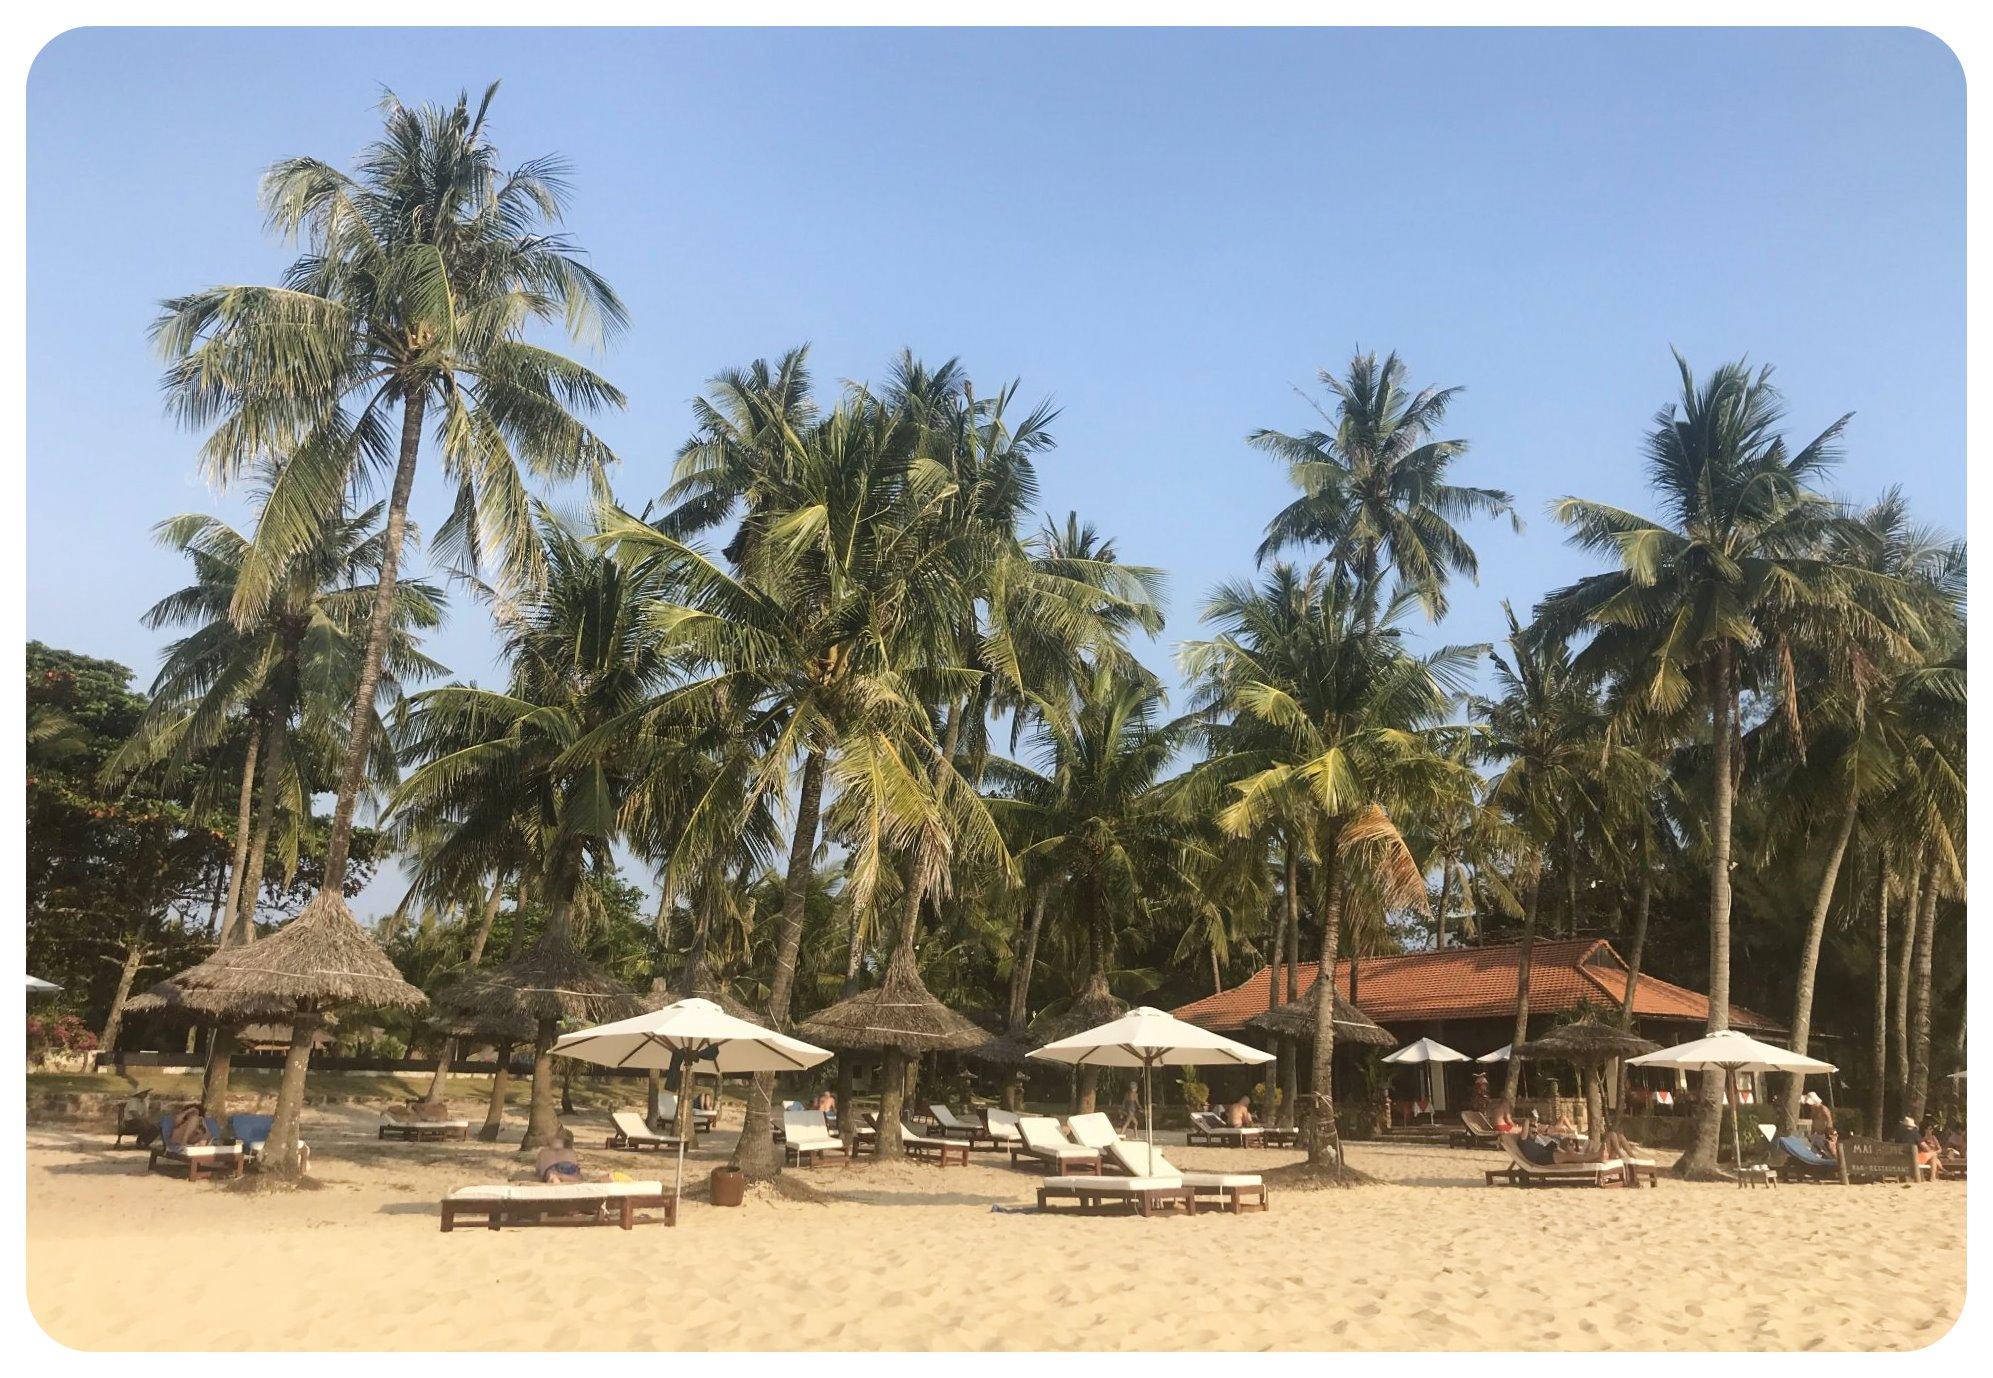 phu quoc vietnam beach2